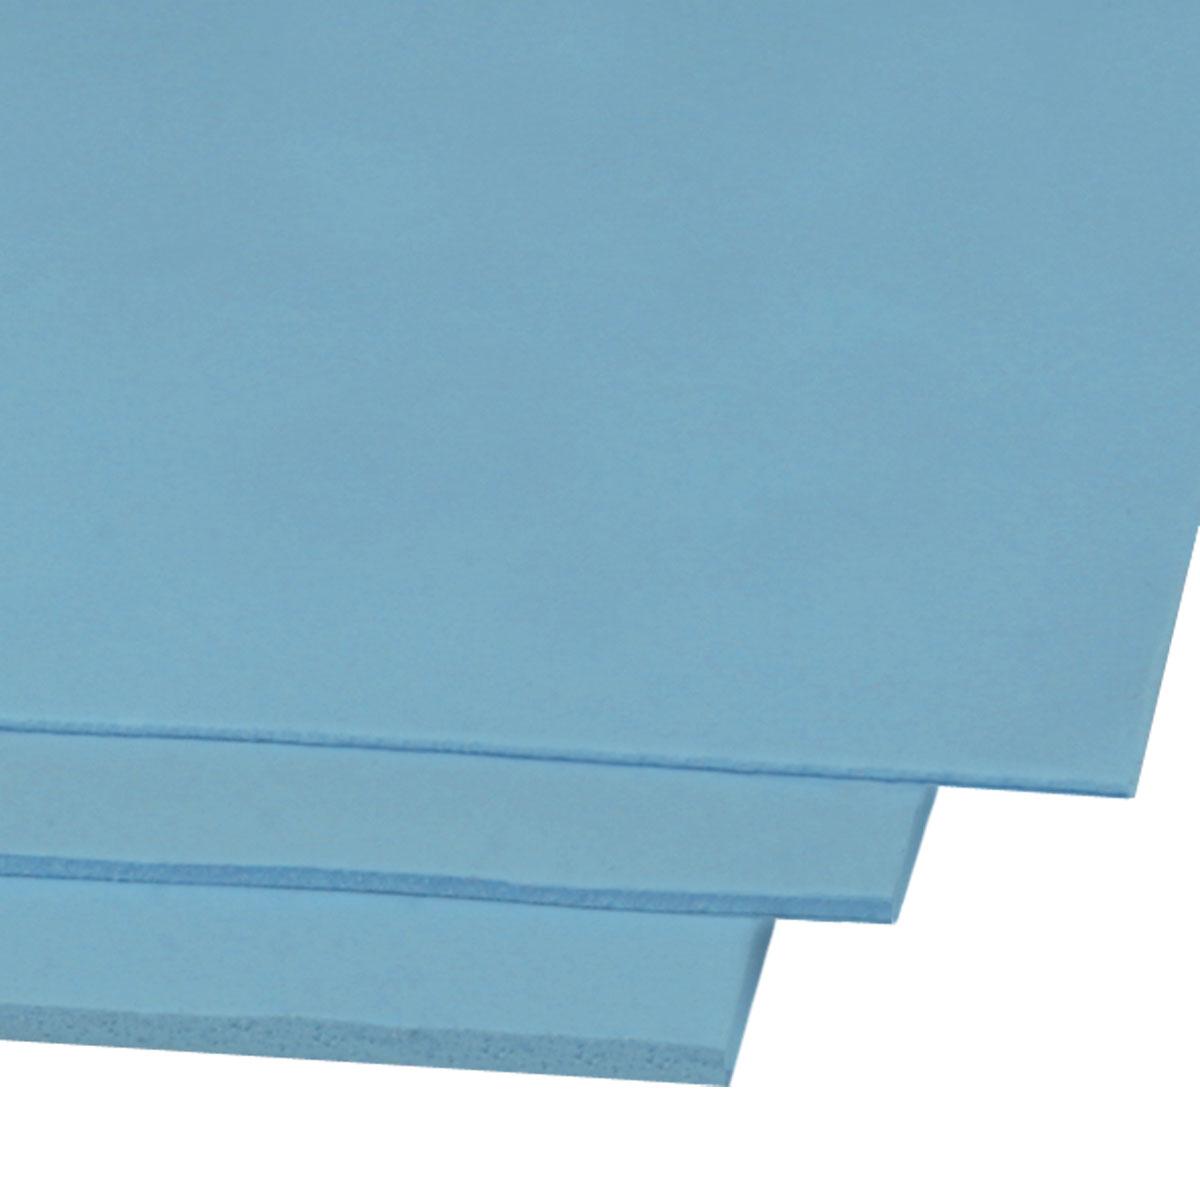 Arctic - Thermal Pad Arctic 145 x 145 x 1mm